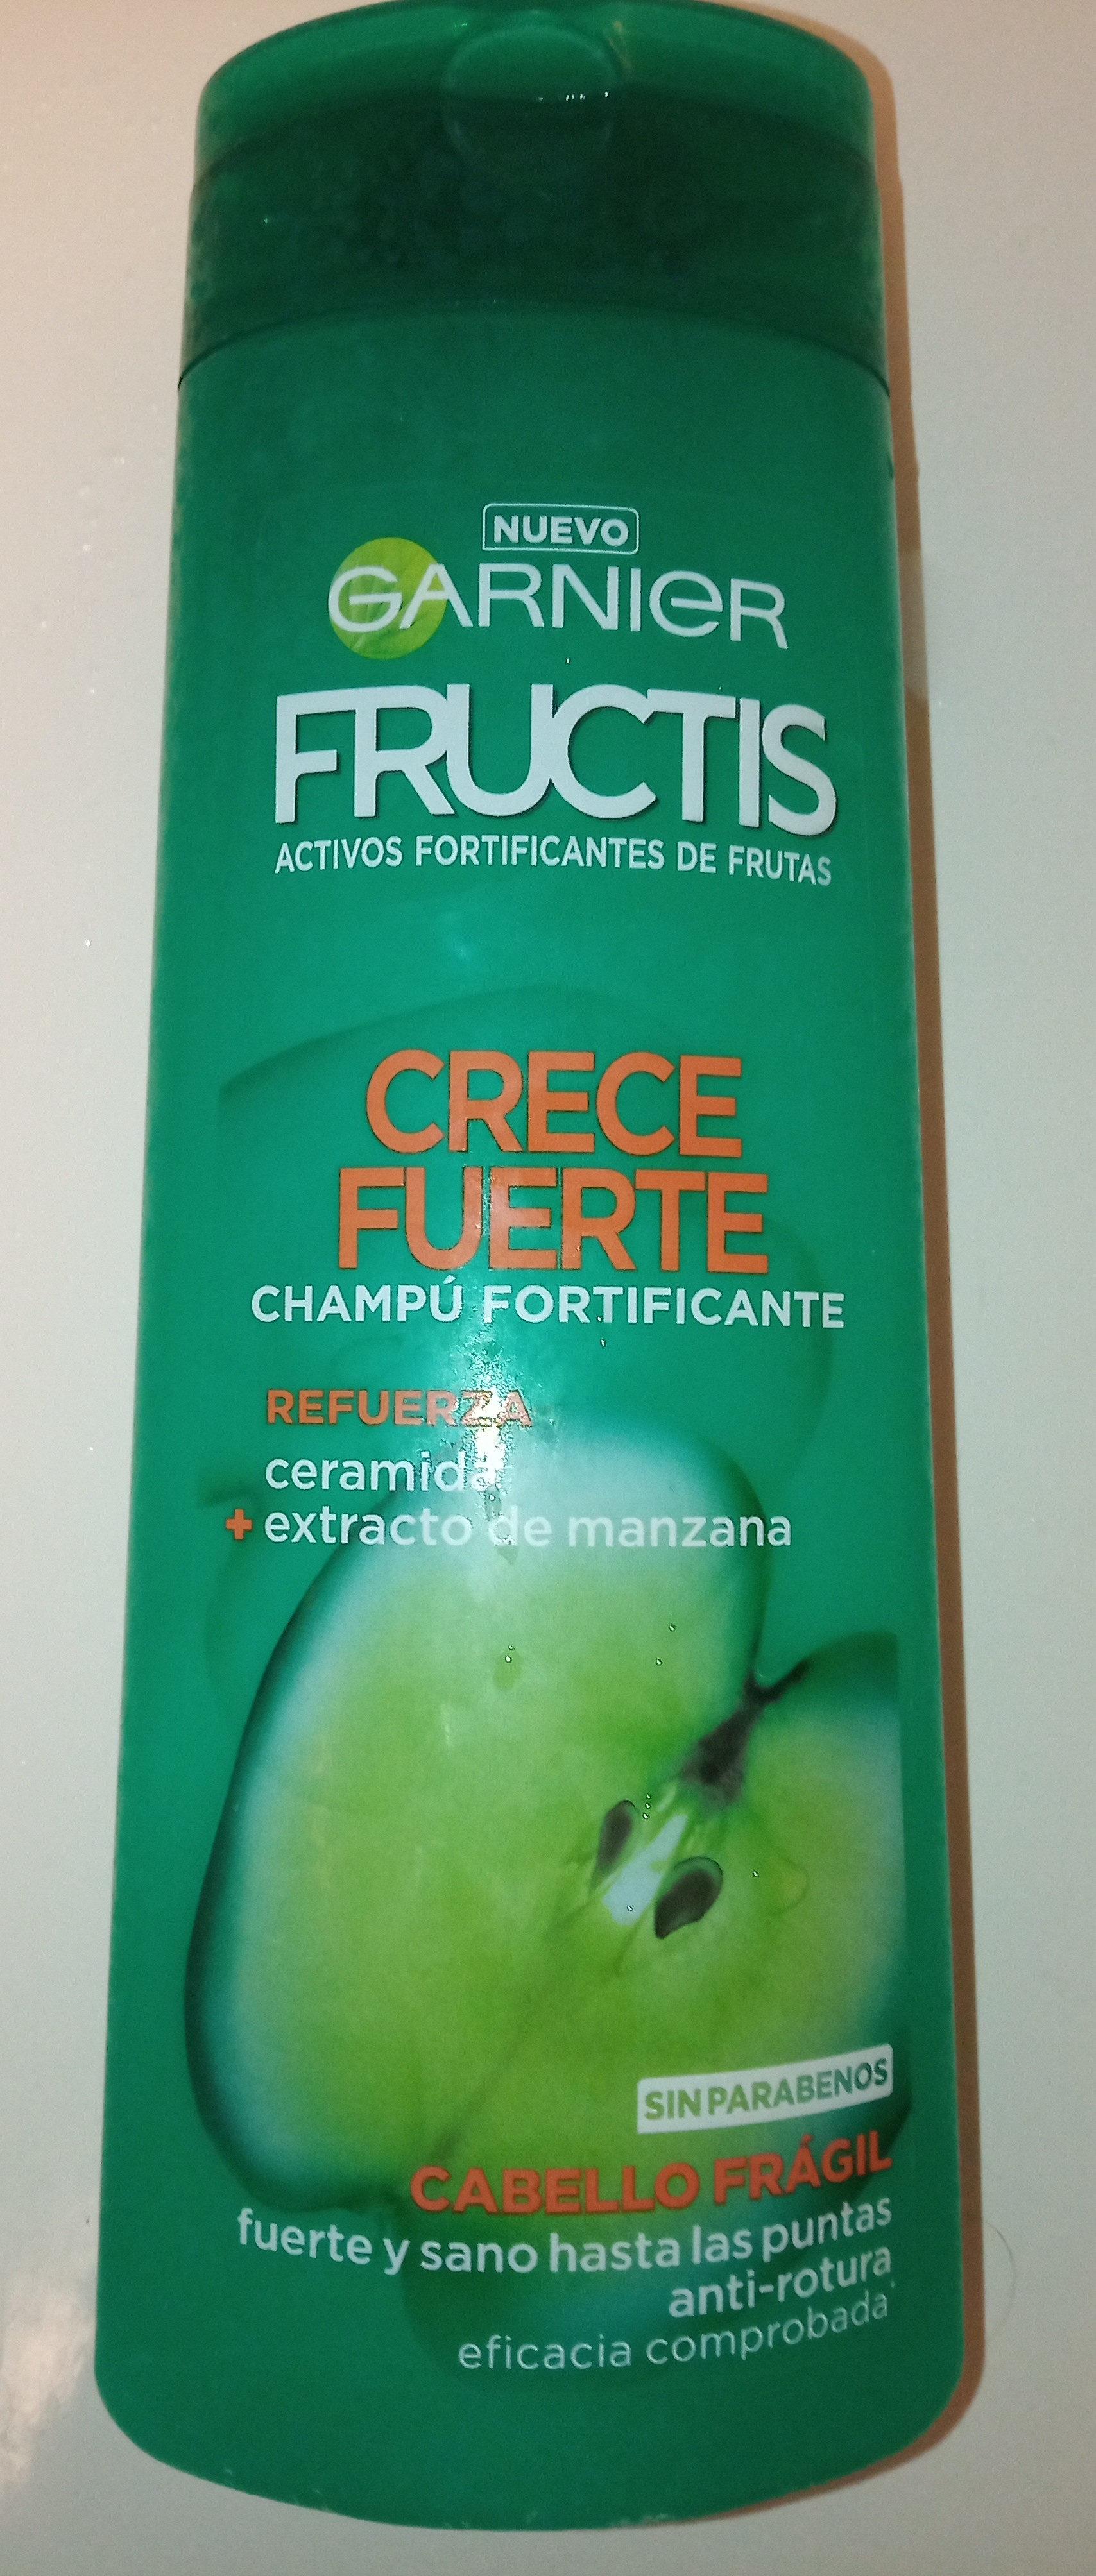 Crece Fuerte Champú Fortificante - Product